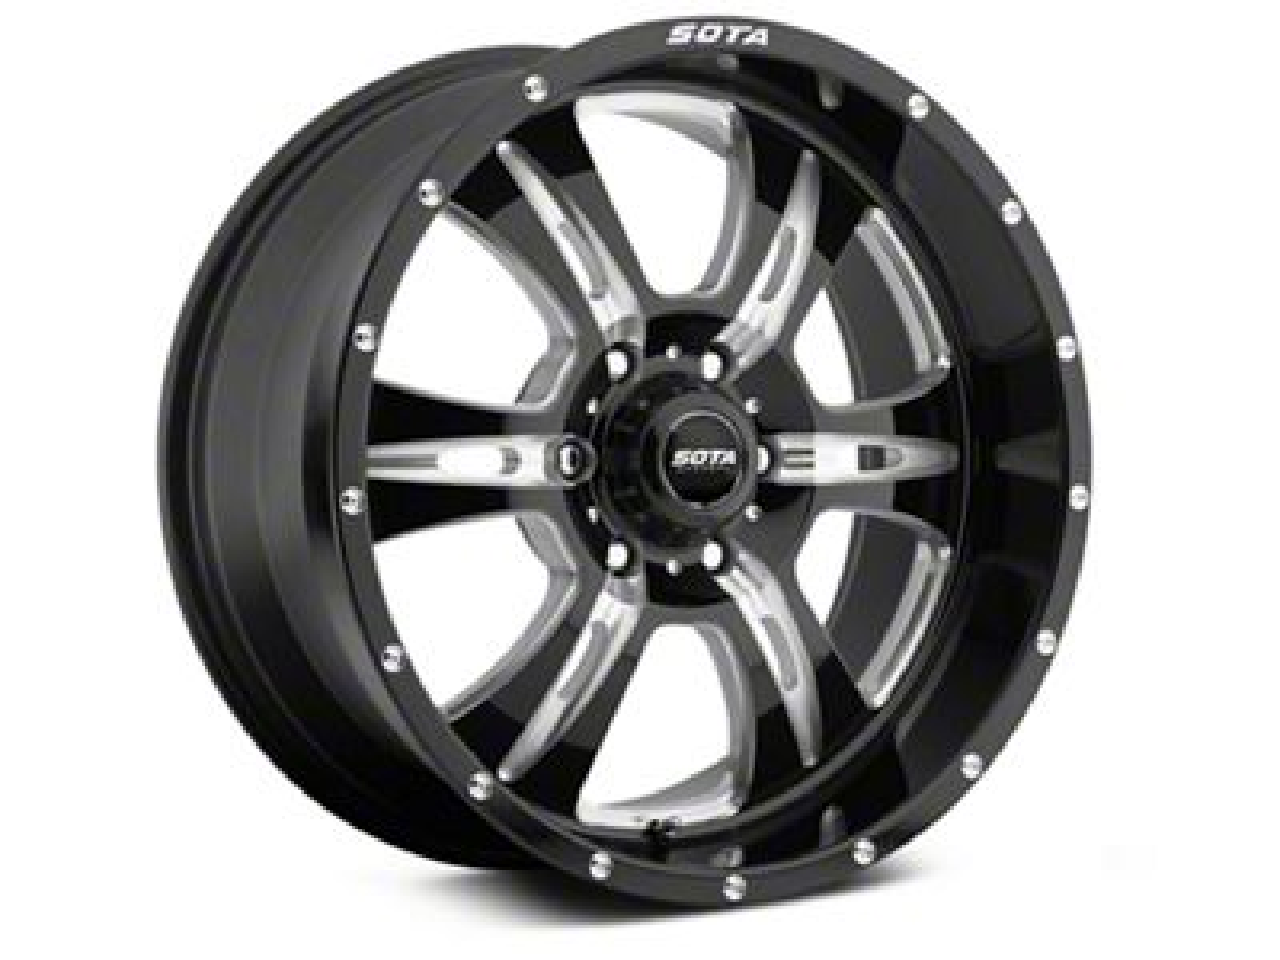 SOTA Off Road REHAB Death Metal 6-Lug Wheel - 20x9 (99-18 Silverado 1500)